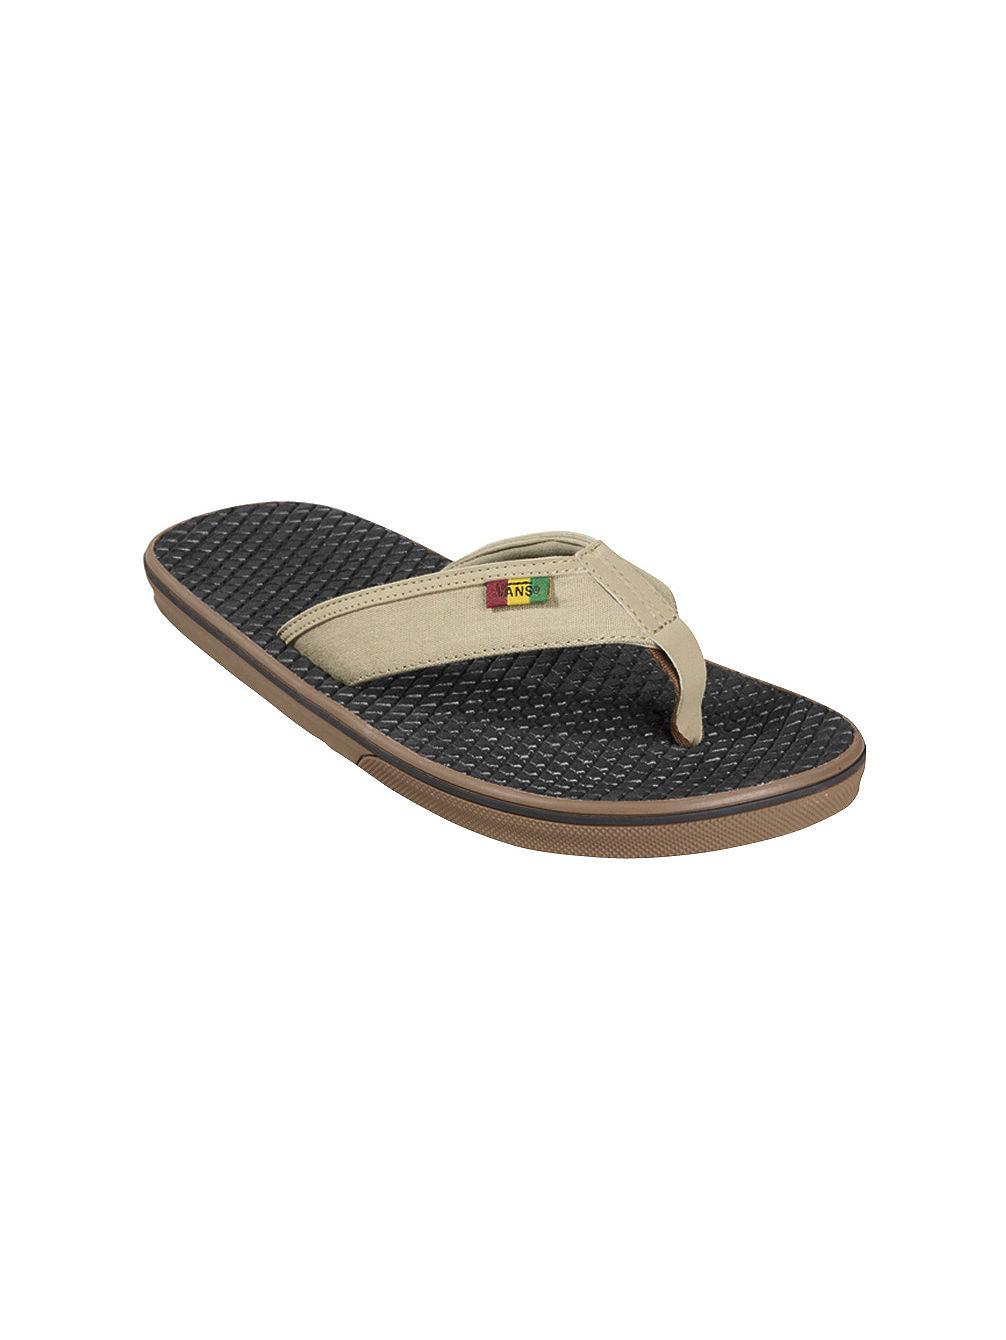 Buy Vans La Costa Sandals online at blue-tomato.com ce81f4356